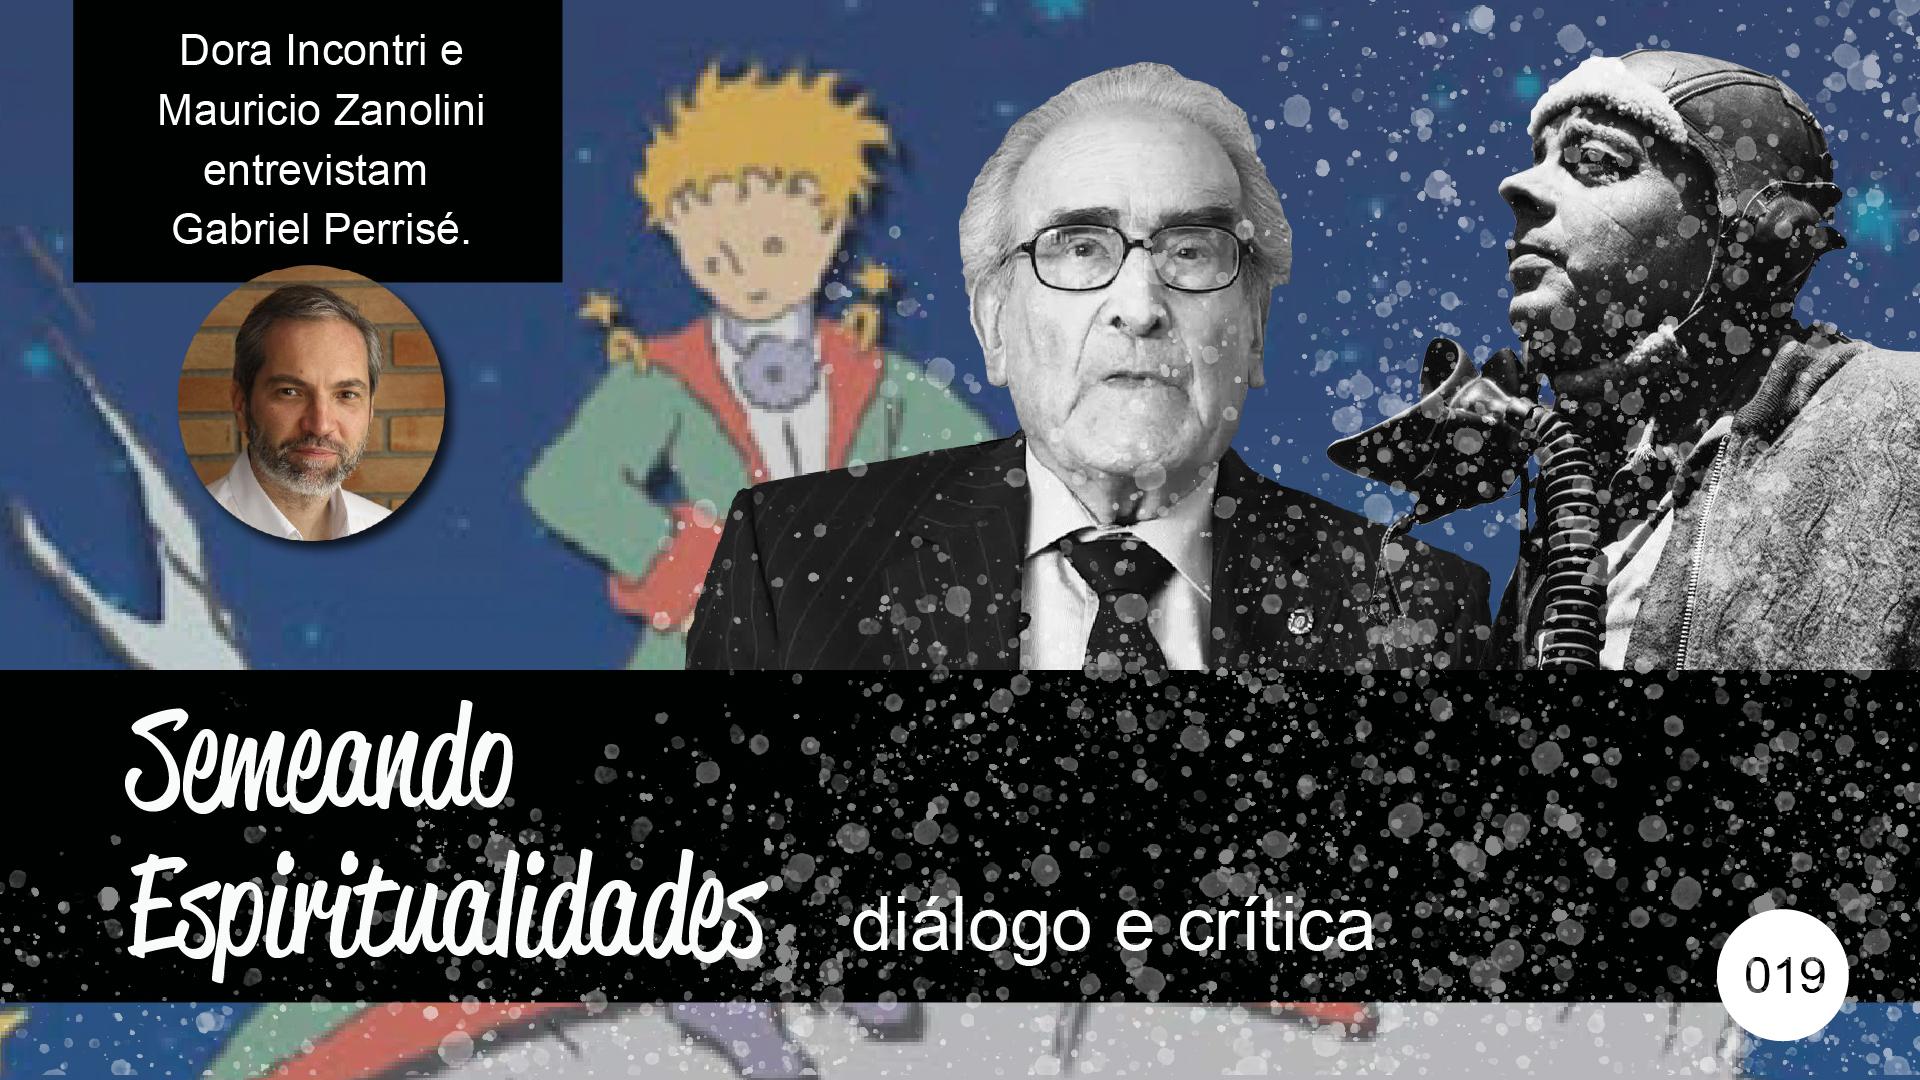 Semeando Espiritualidades – diálogo e crítica (019) – Pedagogia do Encontro.